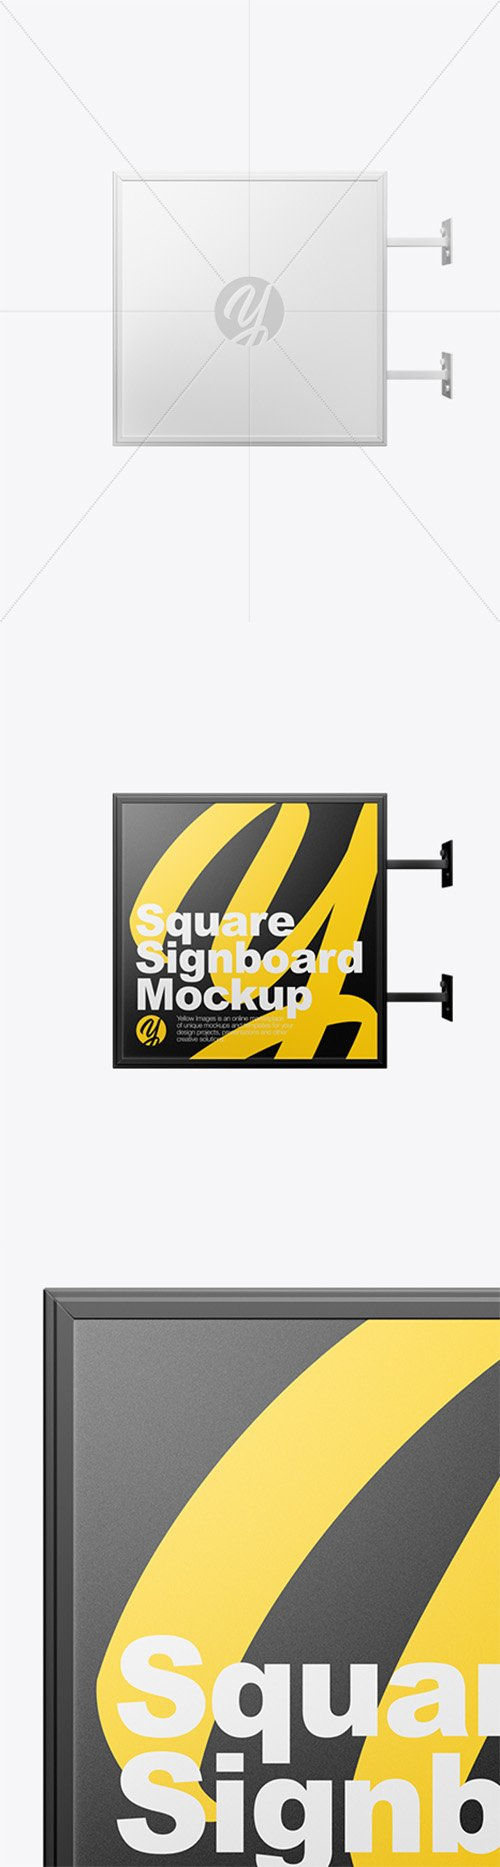 Square Signboard Wall Mounted Mockup 43697 TIF